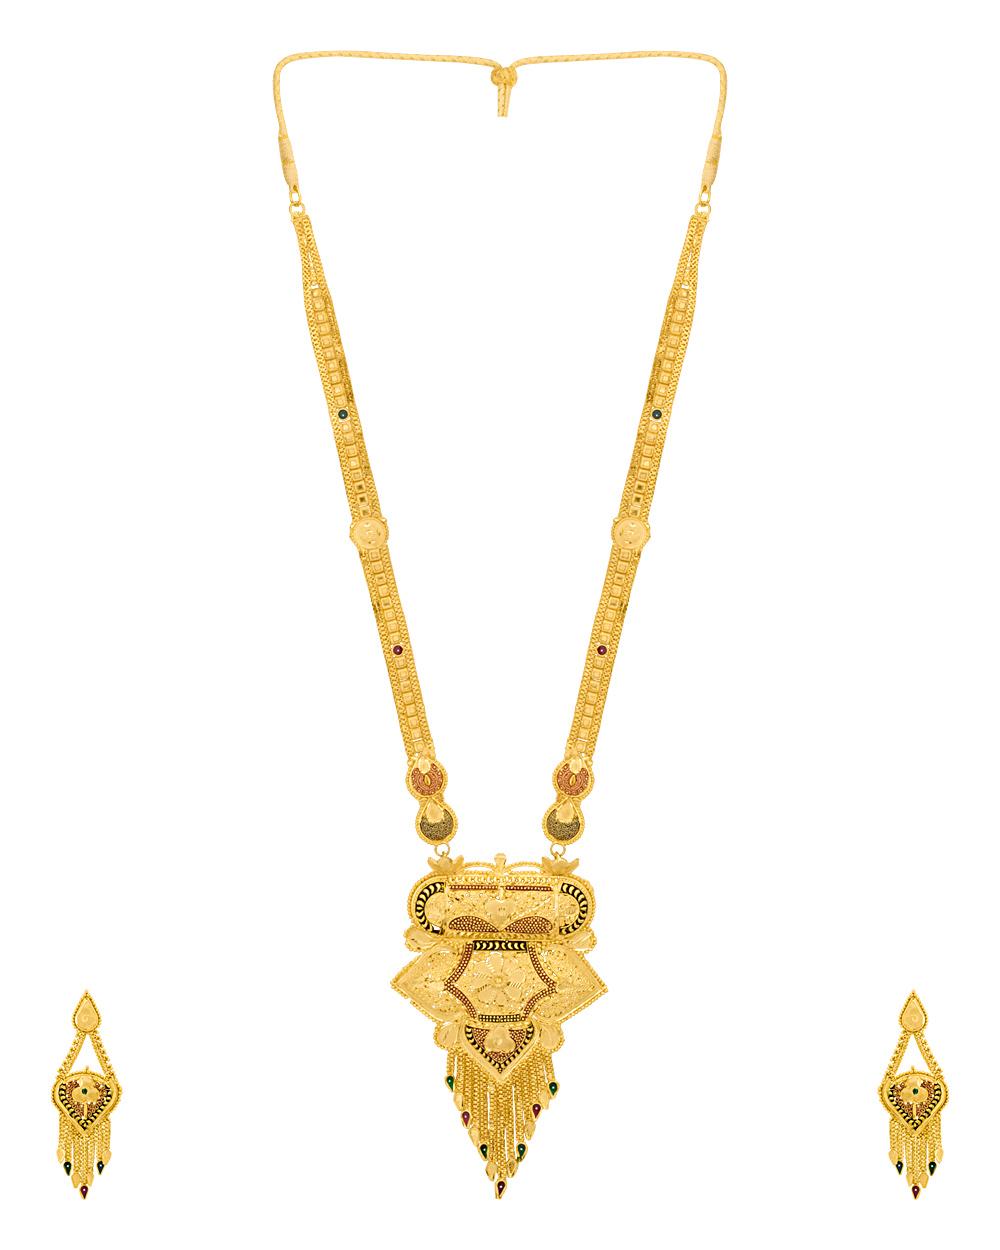 Buy Rani Haar Gold Plated Necklace Set Online India | Voylla